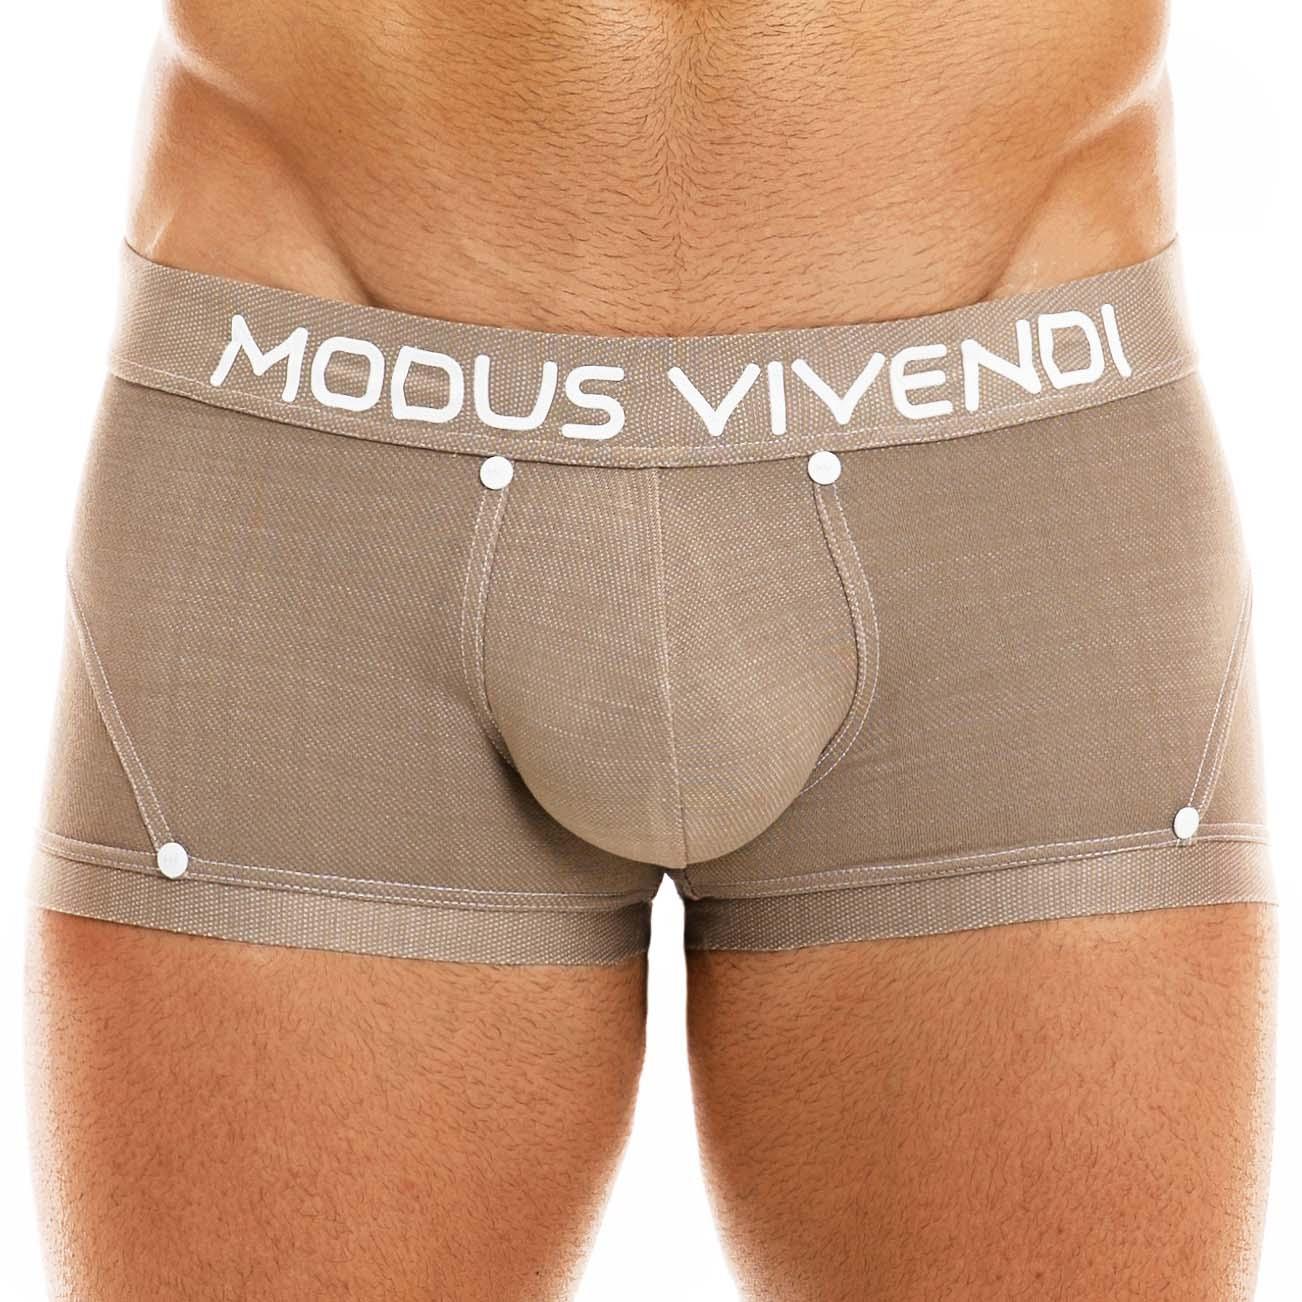 Boxer Modus Vivendi Jeans 05021